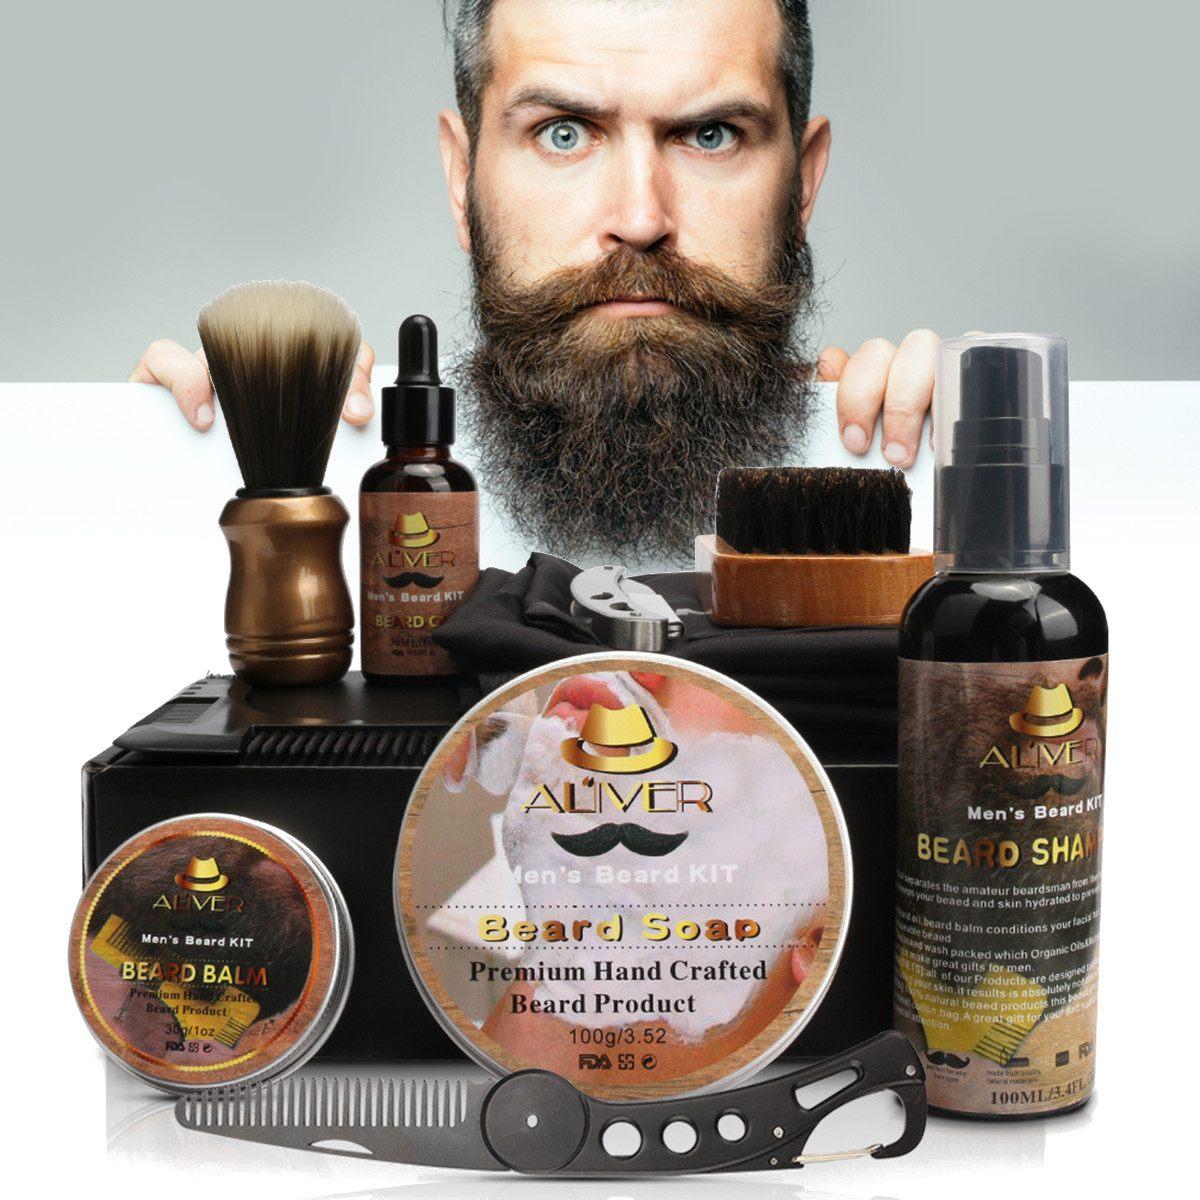 11 Pcs/set Beard Suit Beard Comb Brush Cream Shampoo Beard Styling Care Cleaning Kit Brush Balm Razor Care for Men Grooming Gift